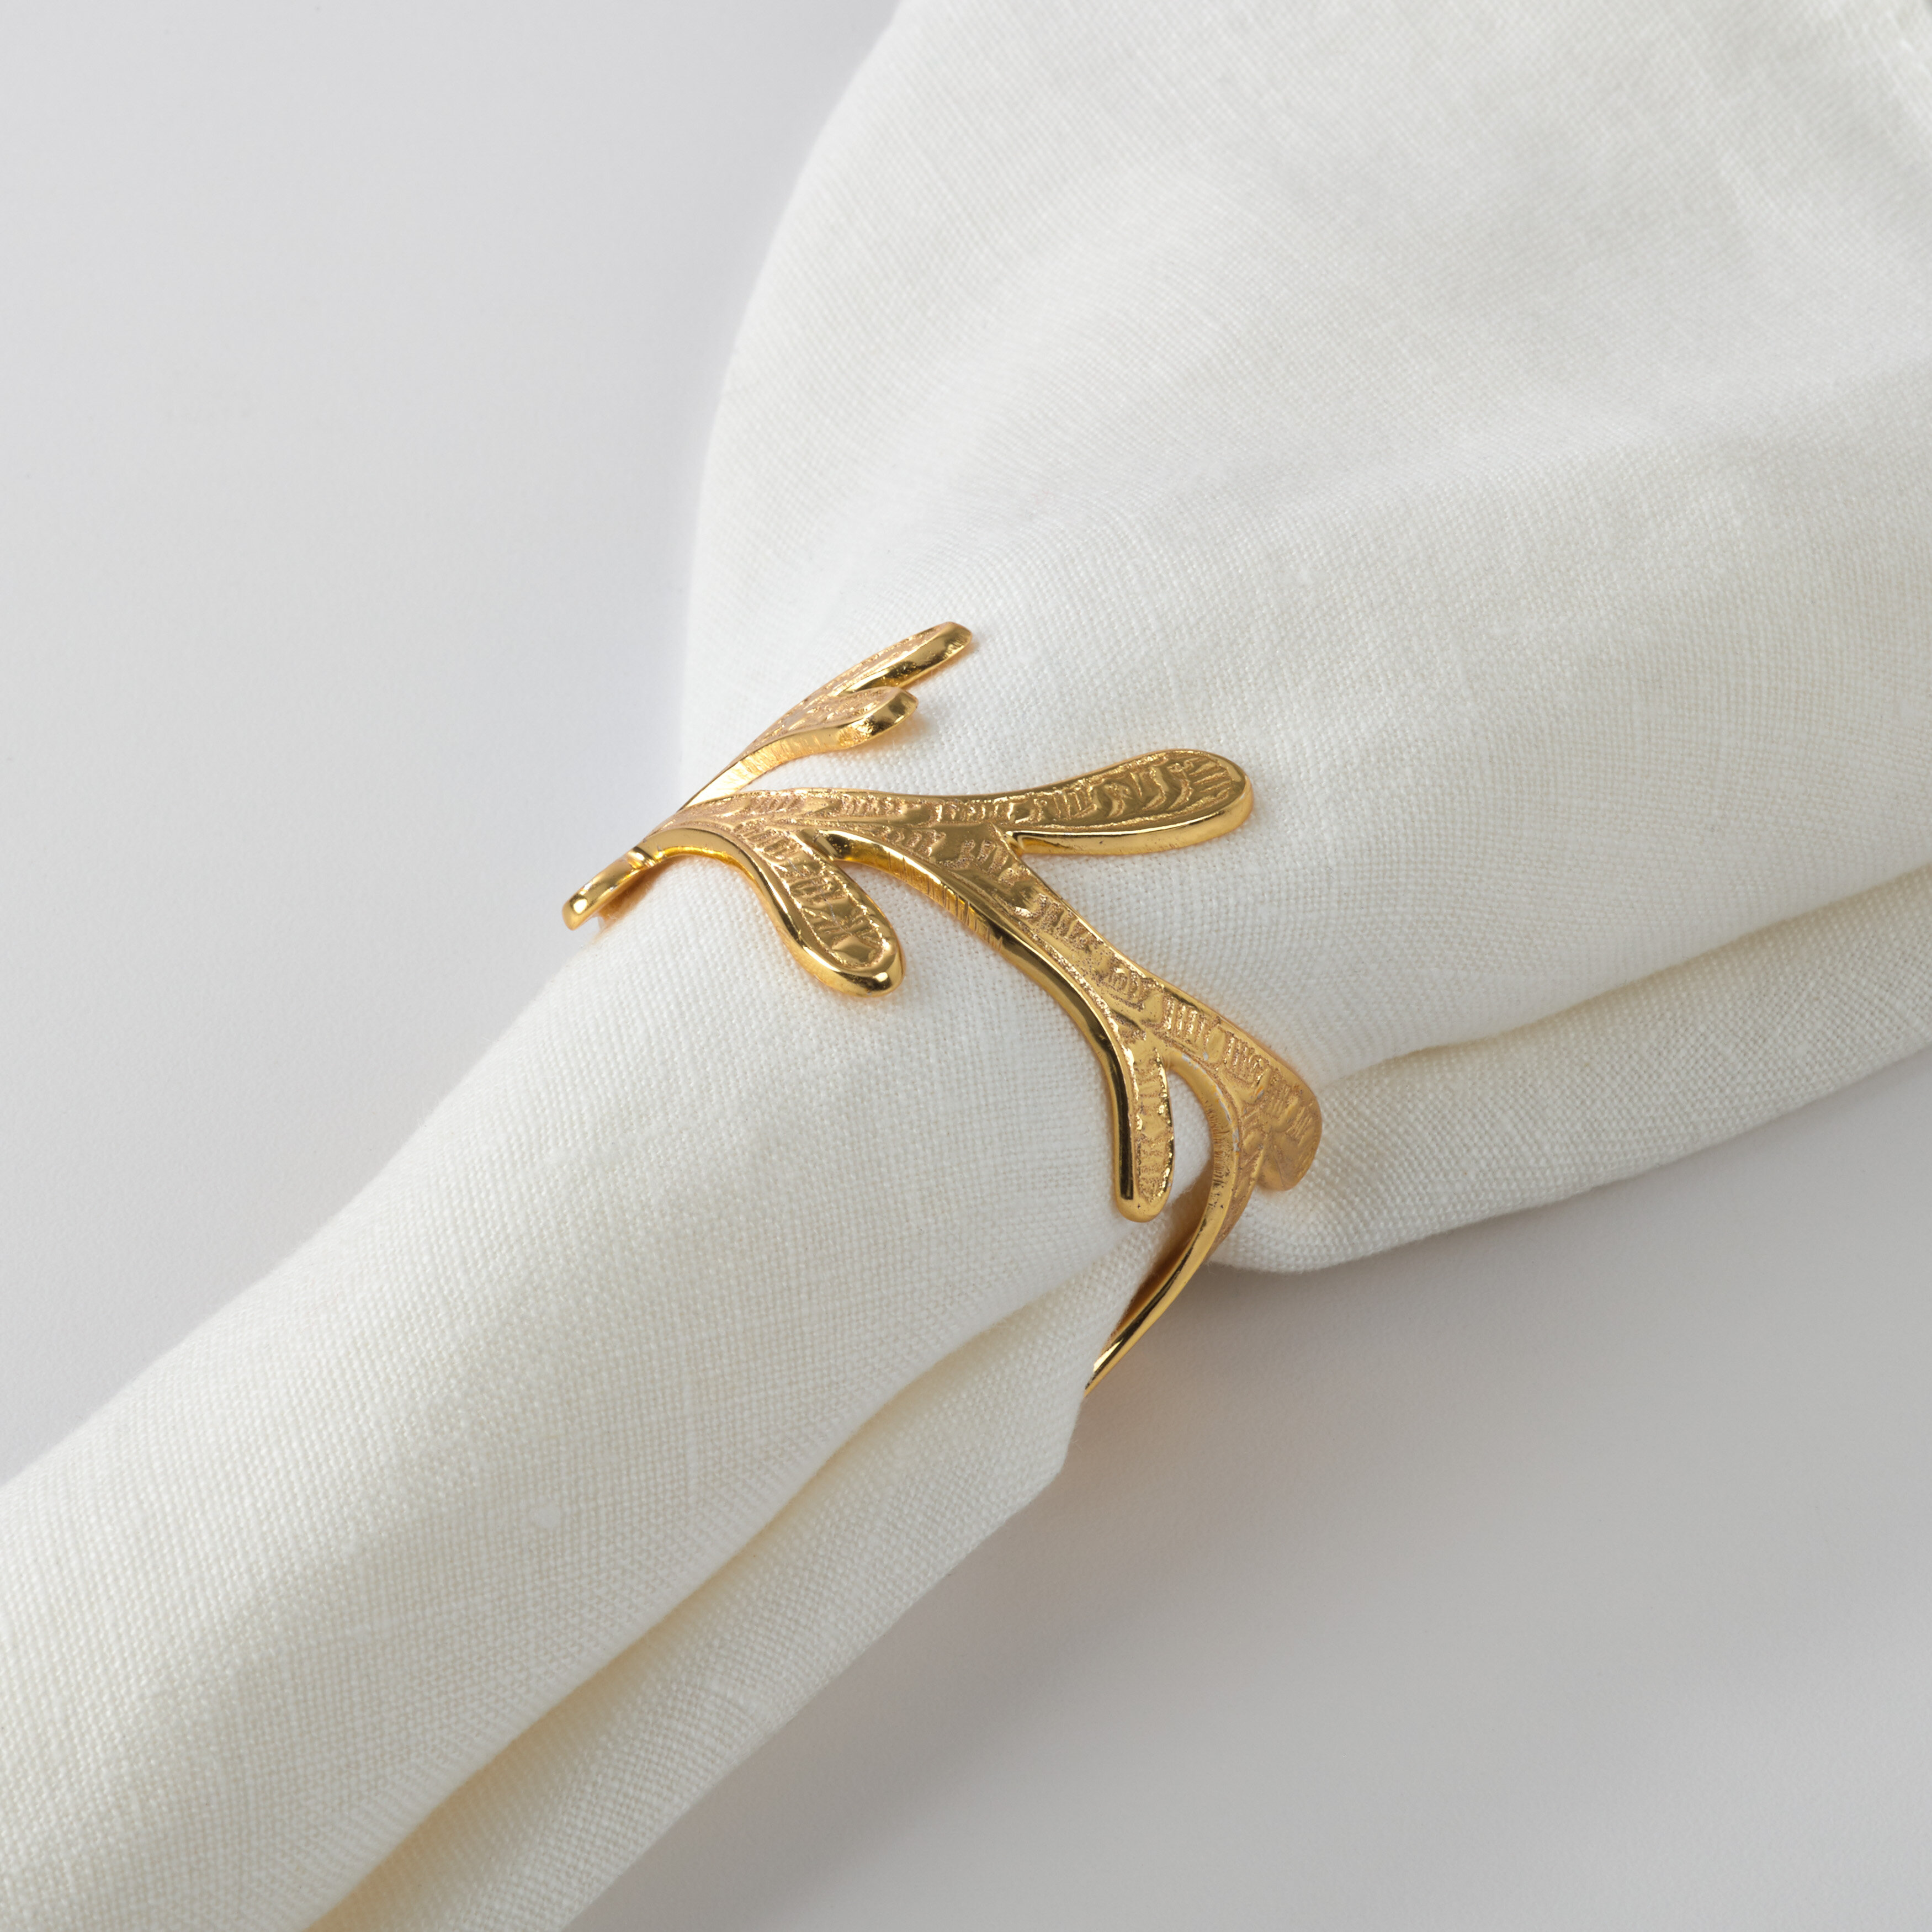 Set Of 12 Silver Rose Gold Napkin Rings Set Elegant Crown Napkin Holders For Wedding Party Dinner Table Decor Home Kitchen Tableware